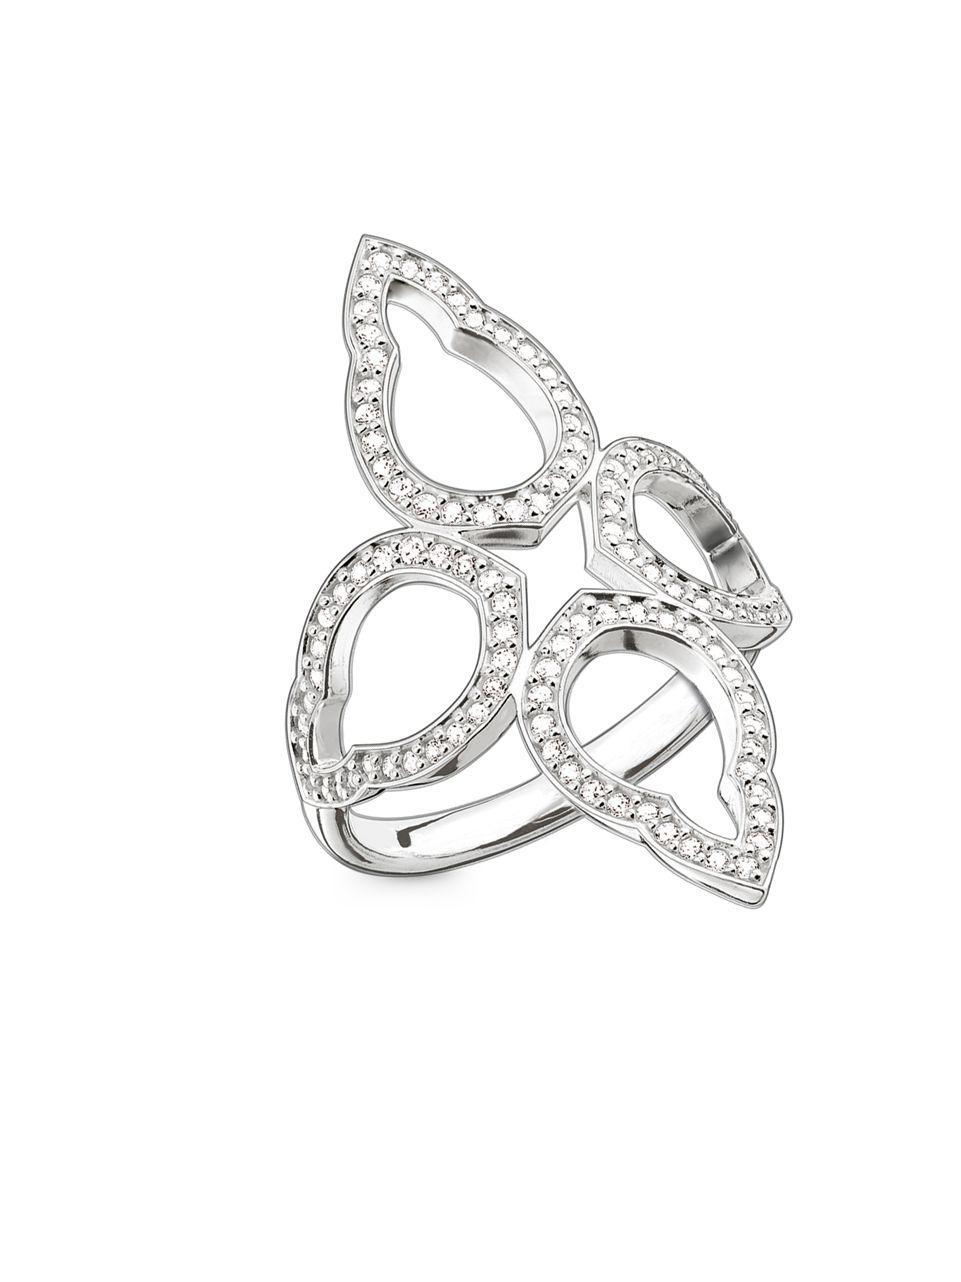 lyst thomas sabo flower oriental sterling silver ring in. Black Bedroom Furniture Sets. Home Design Ideas